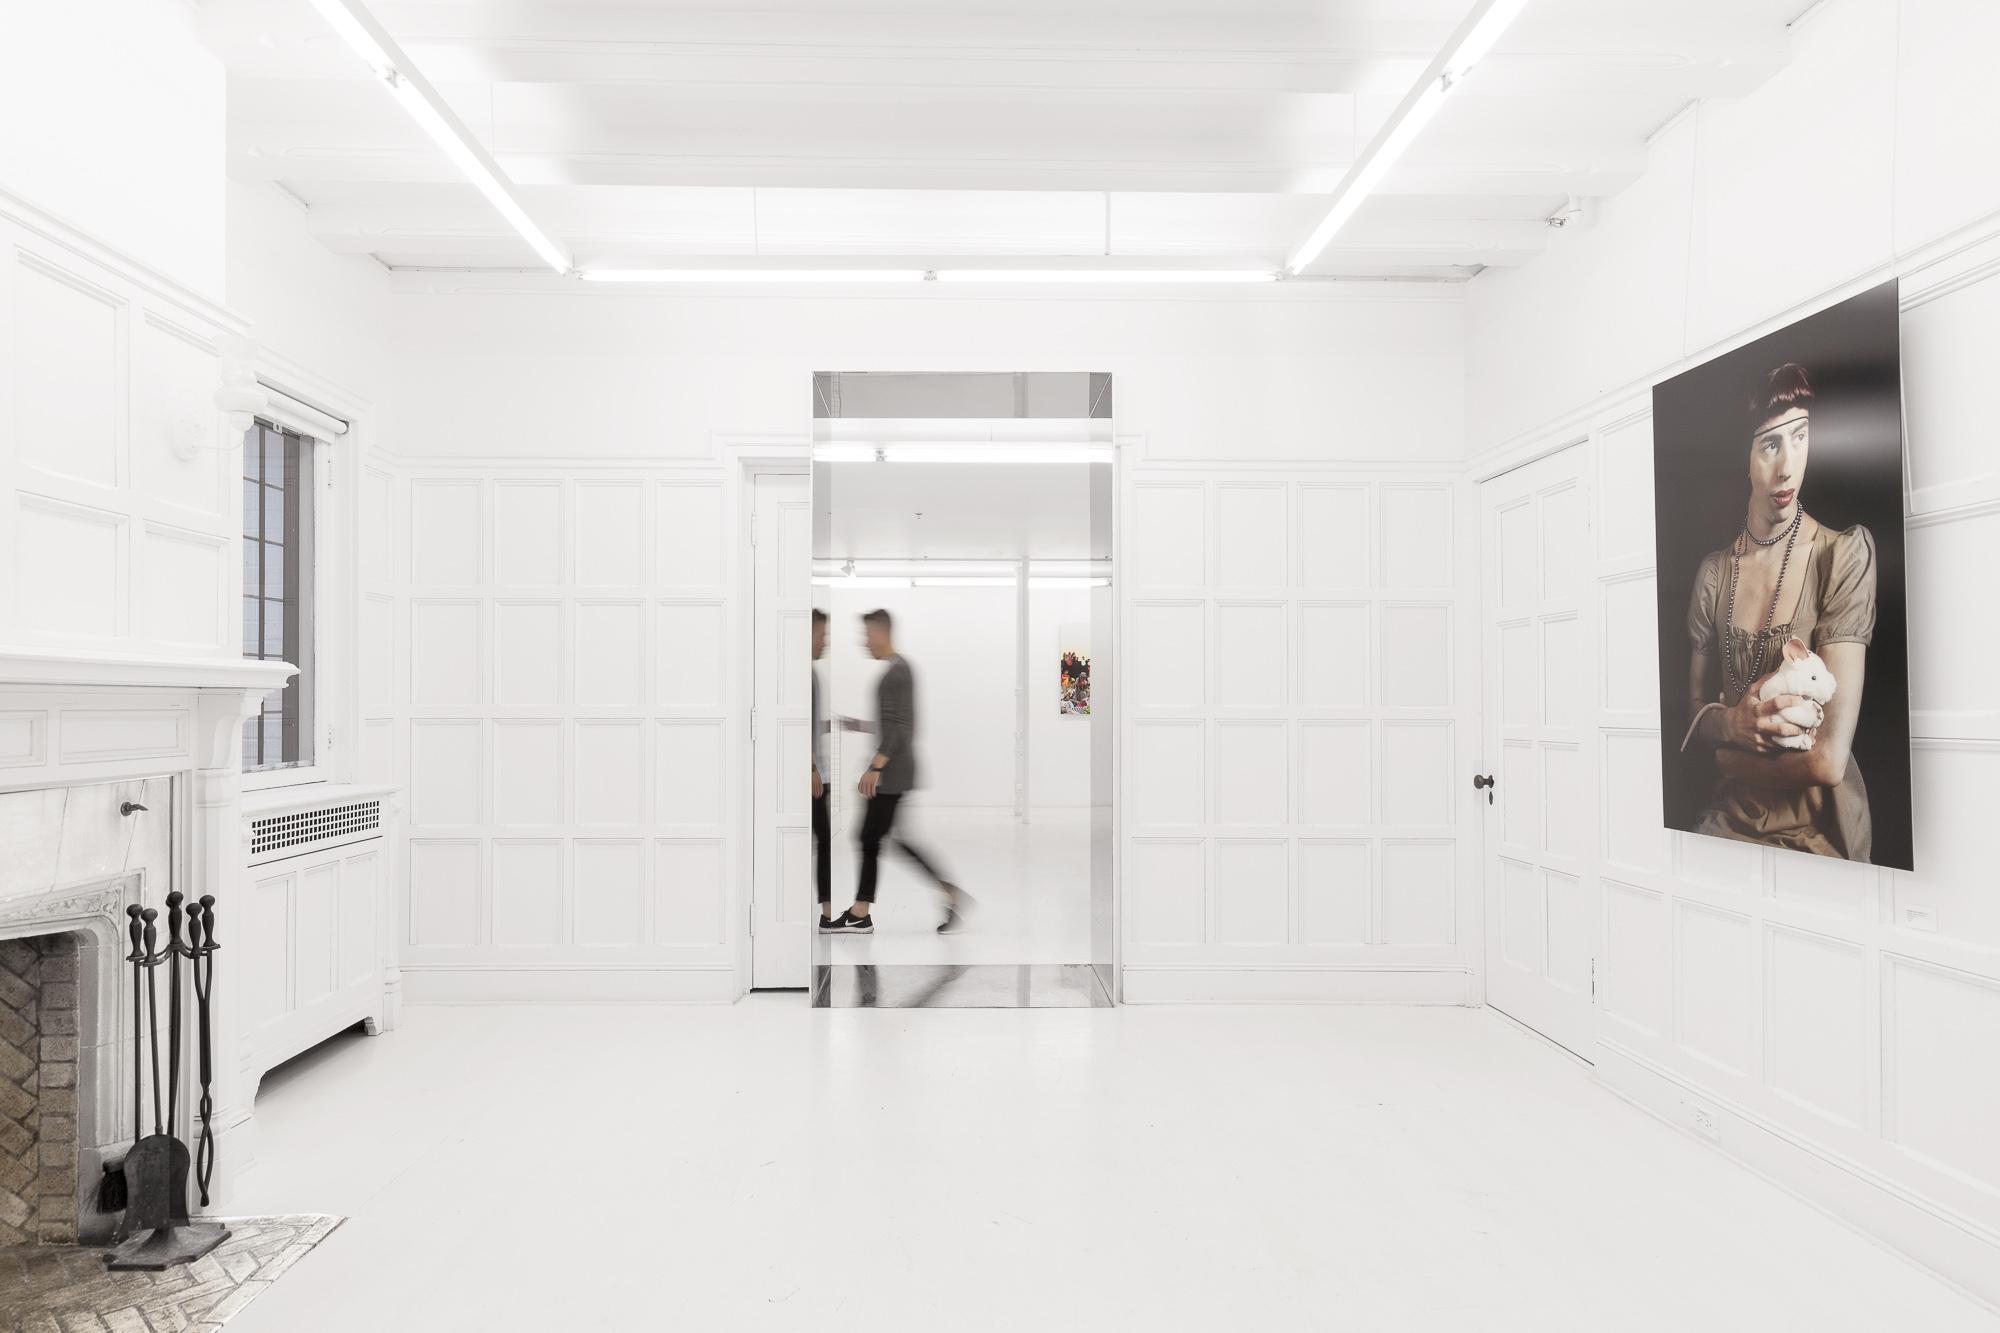 le Livart - Galerie